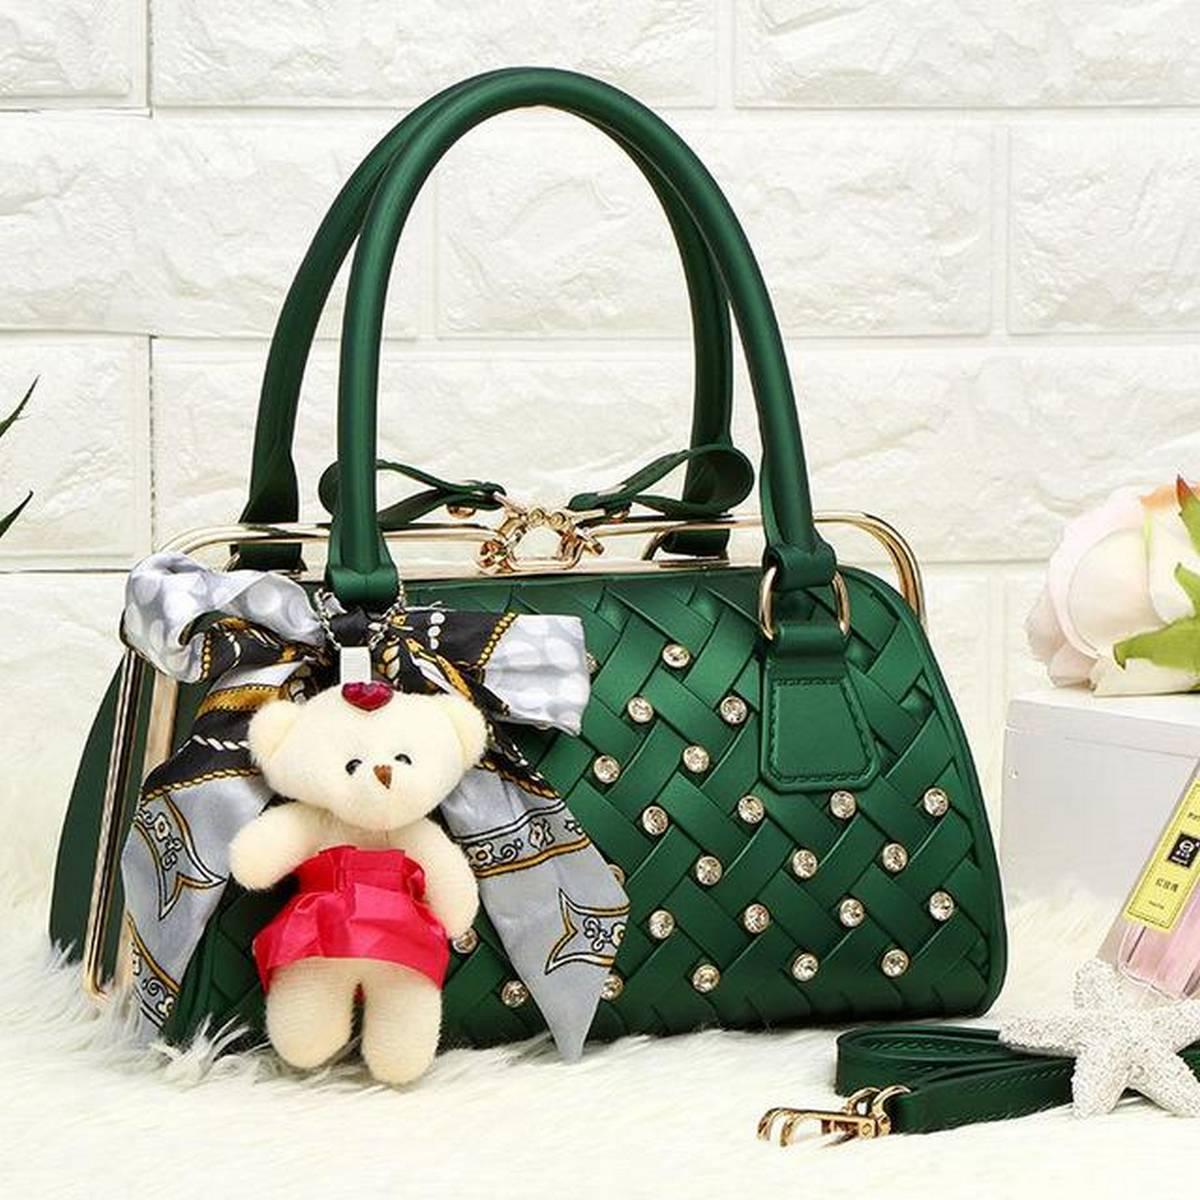 2020 new fashion women messenger bags luxury ladies hand bags women handbag designer jelly evening clutch bags small red bolsa